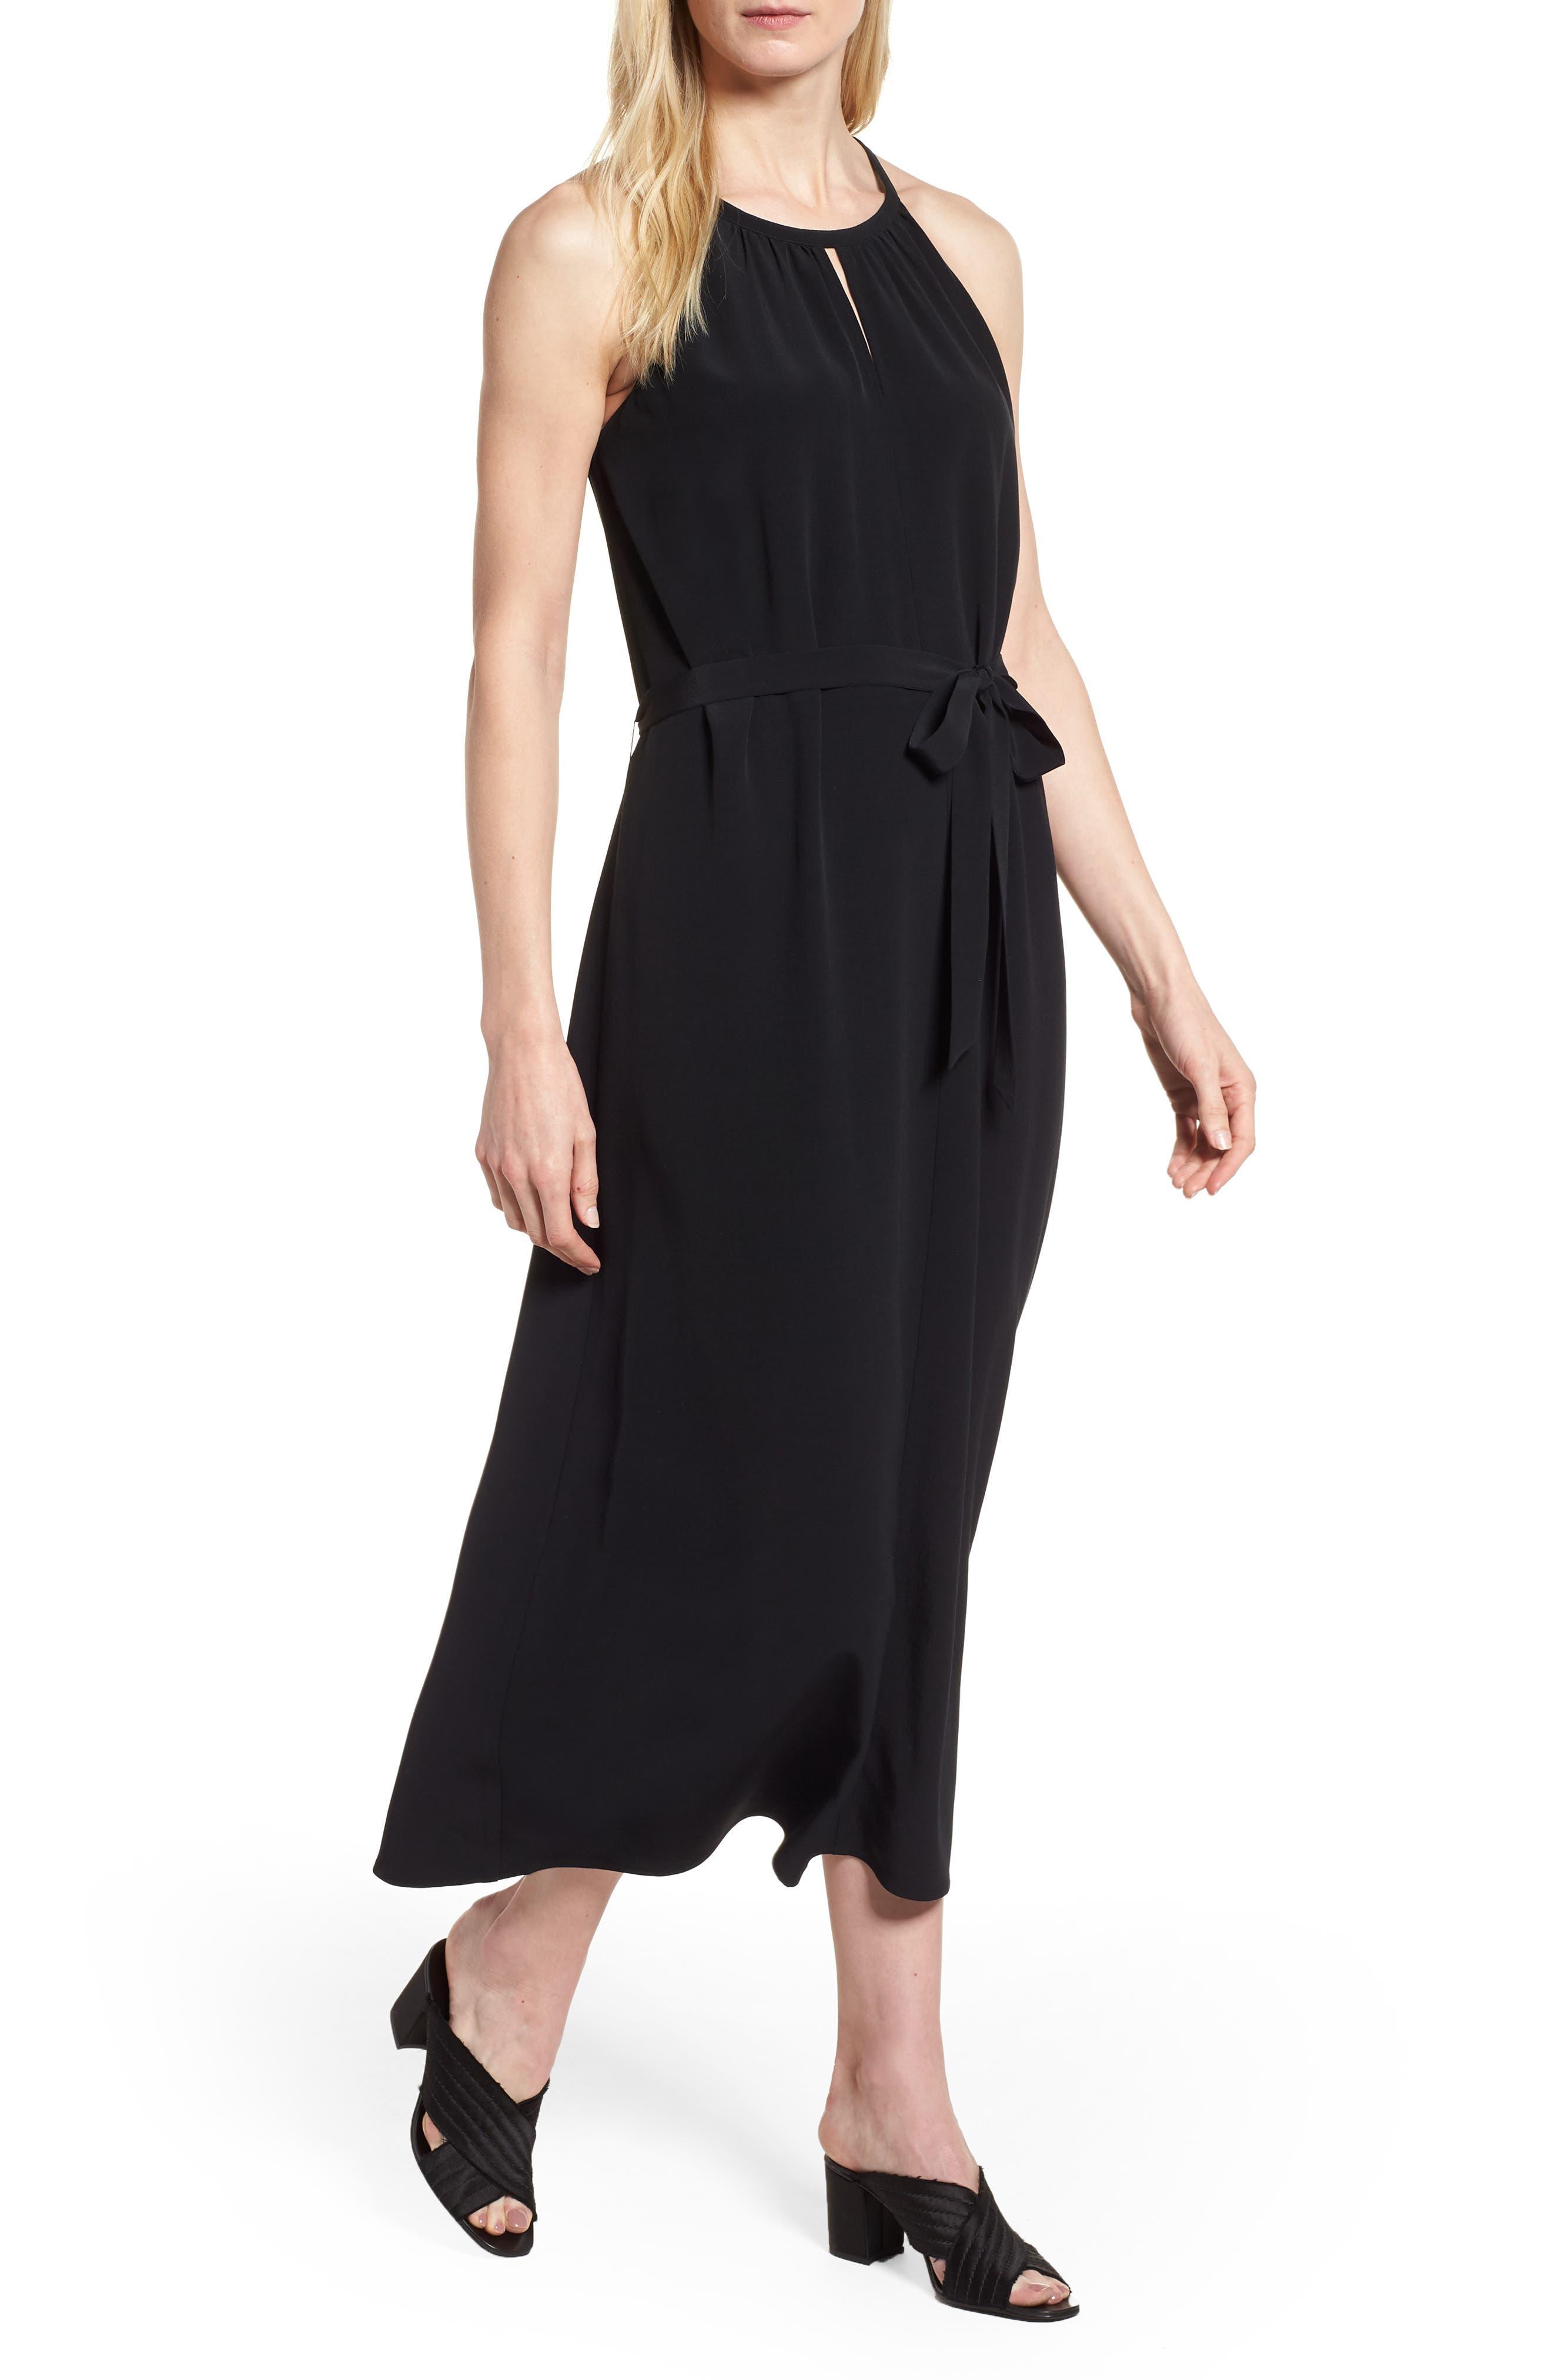 Tencel<sup>®</sup> Lyocell Blend Midi Dress,                             Main thumbnail 1, color,                             Black